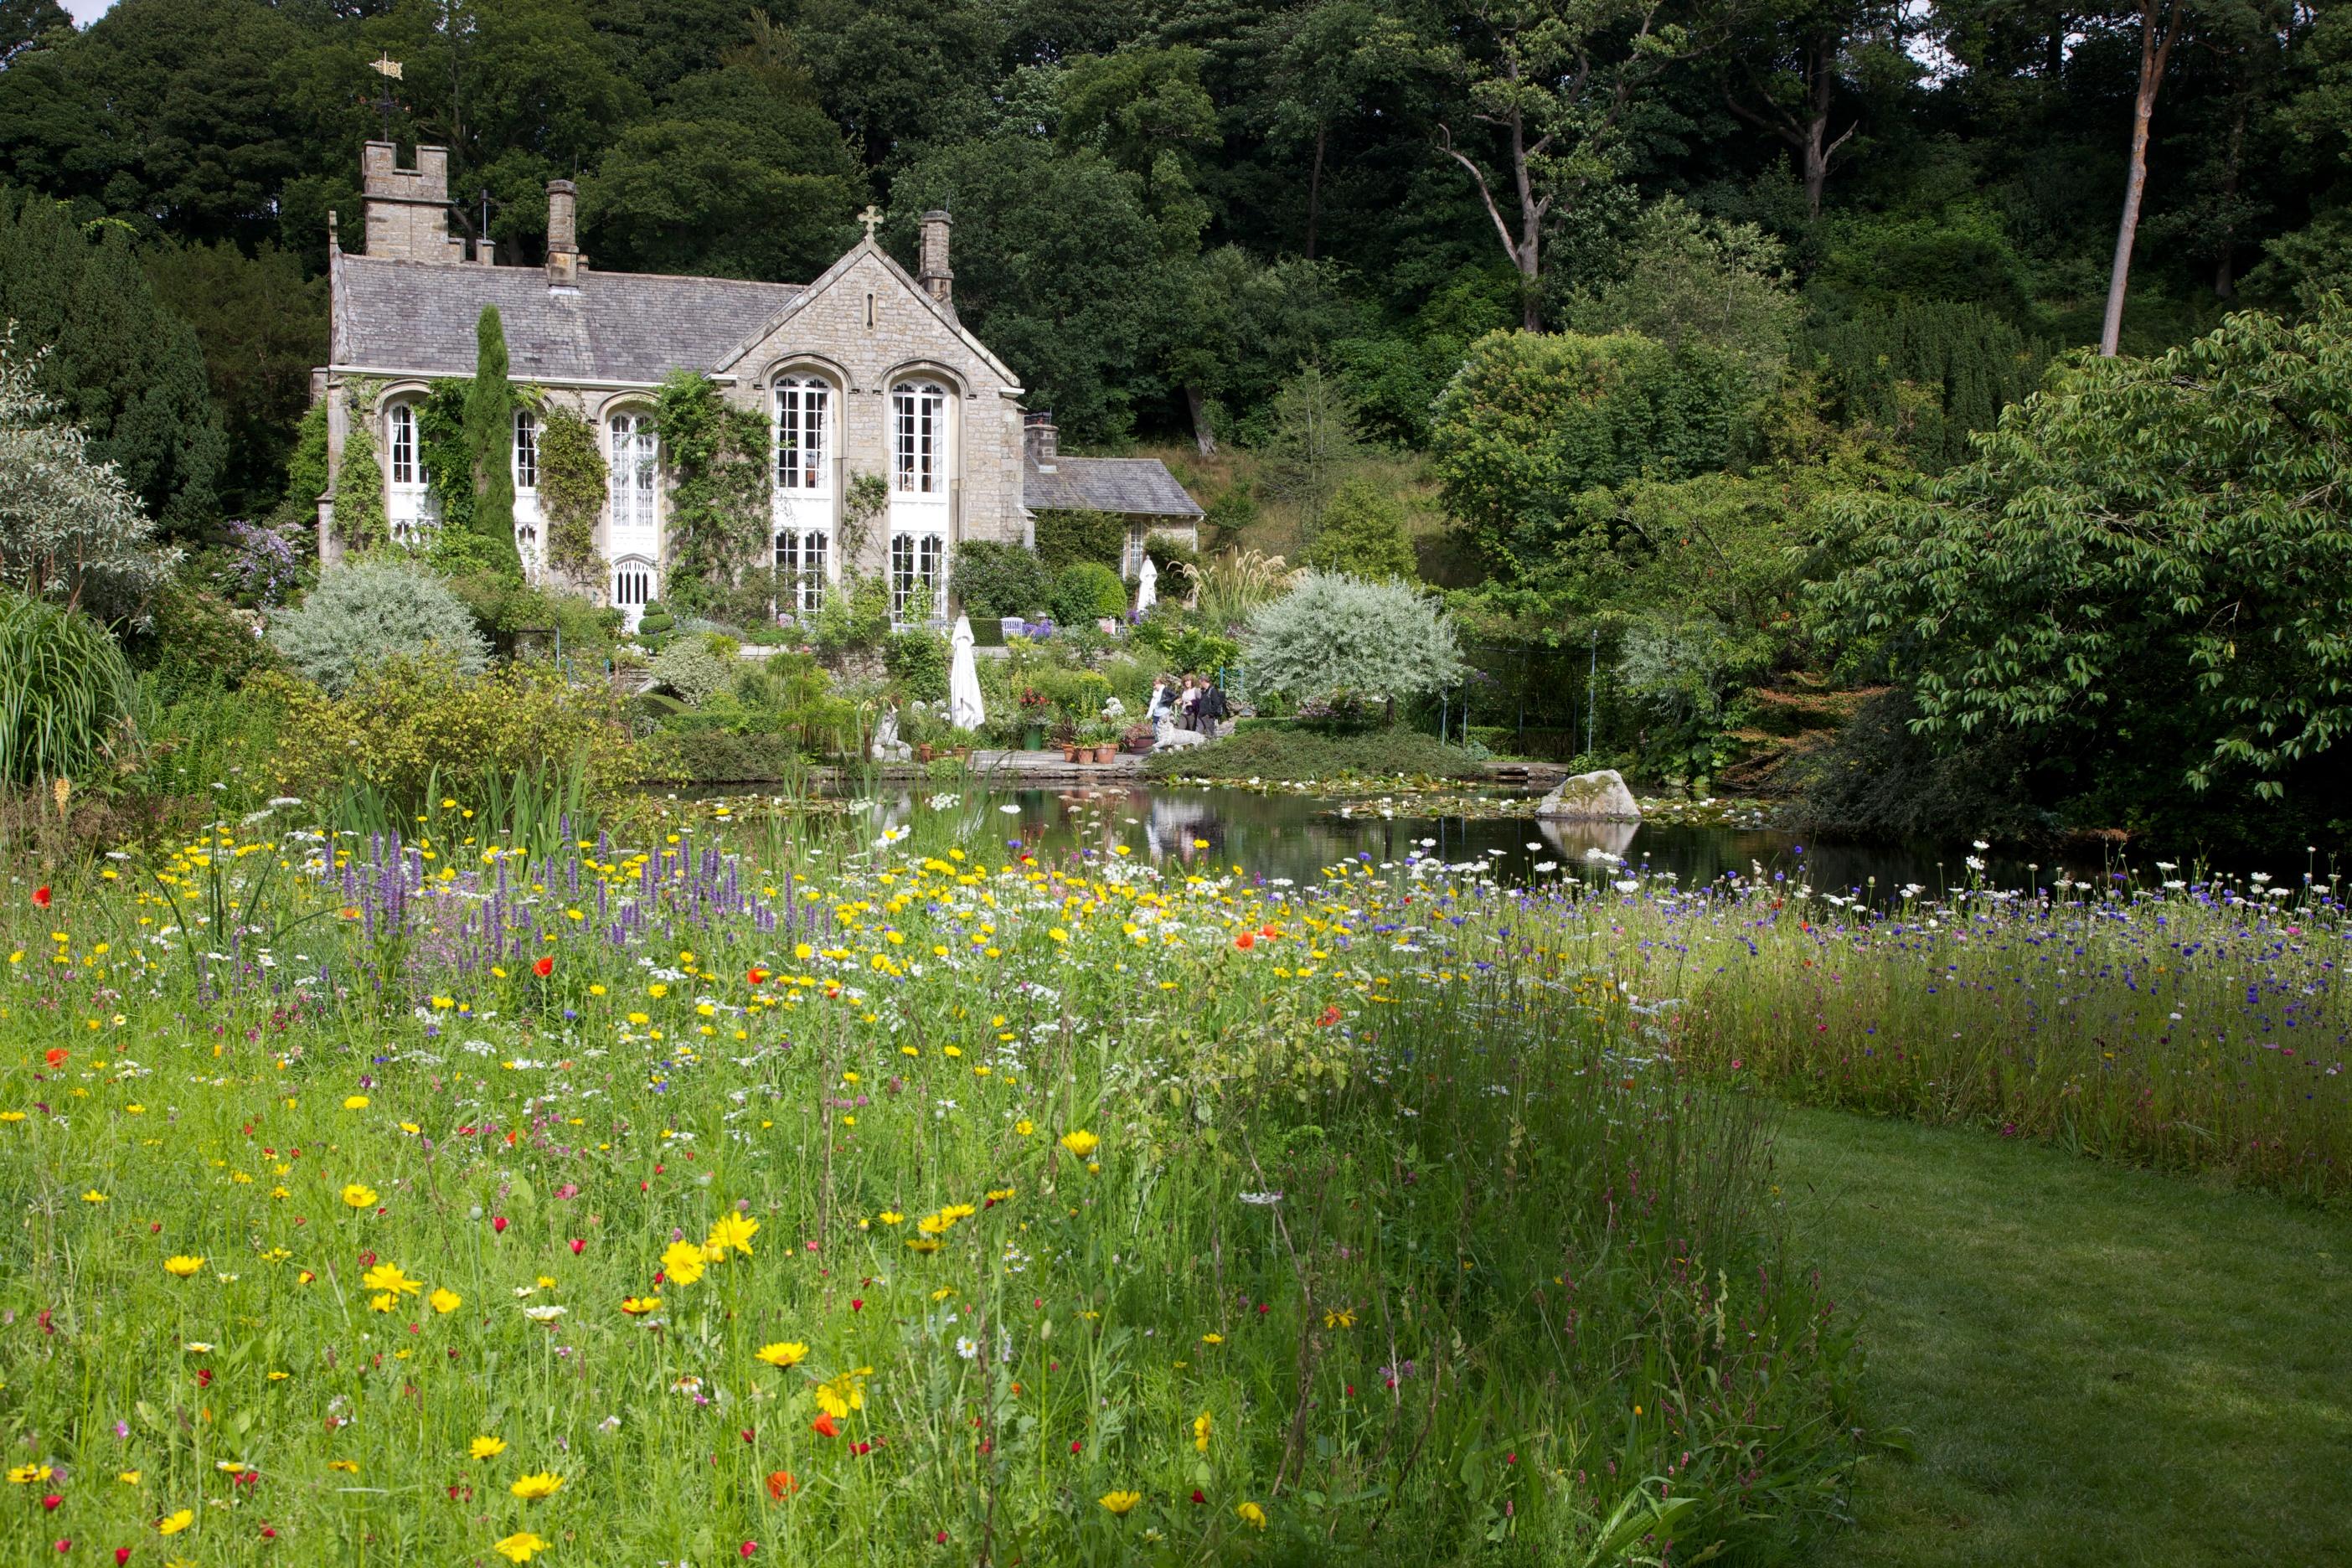 Imagenes del jardin gresgarth hall for Imagenes jardines